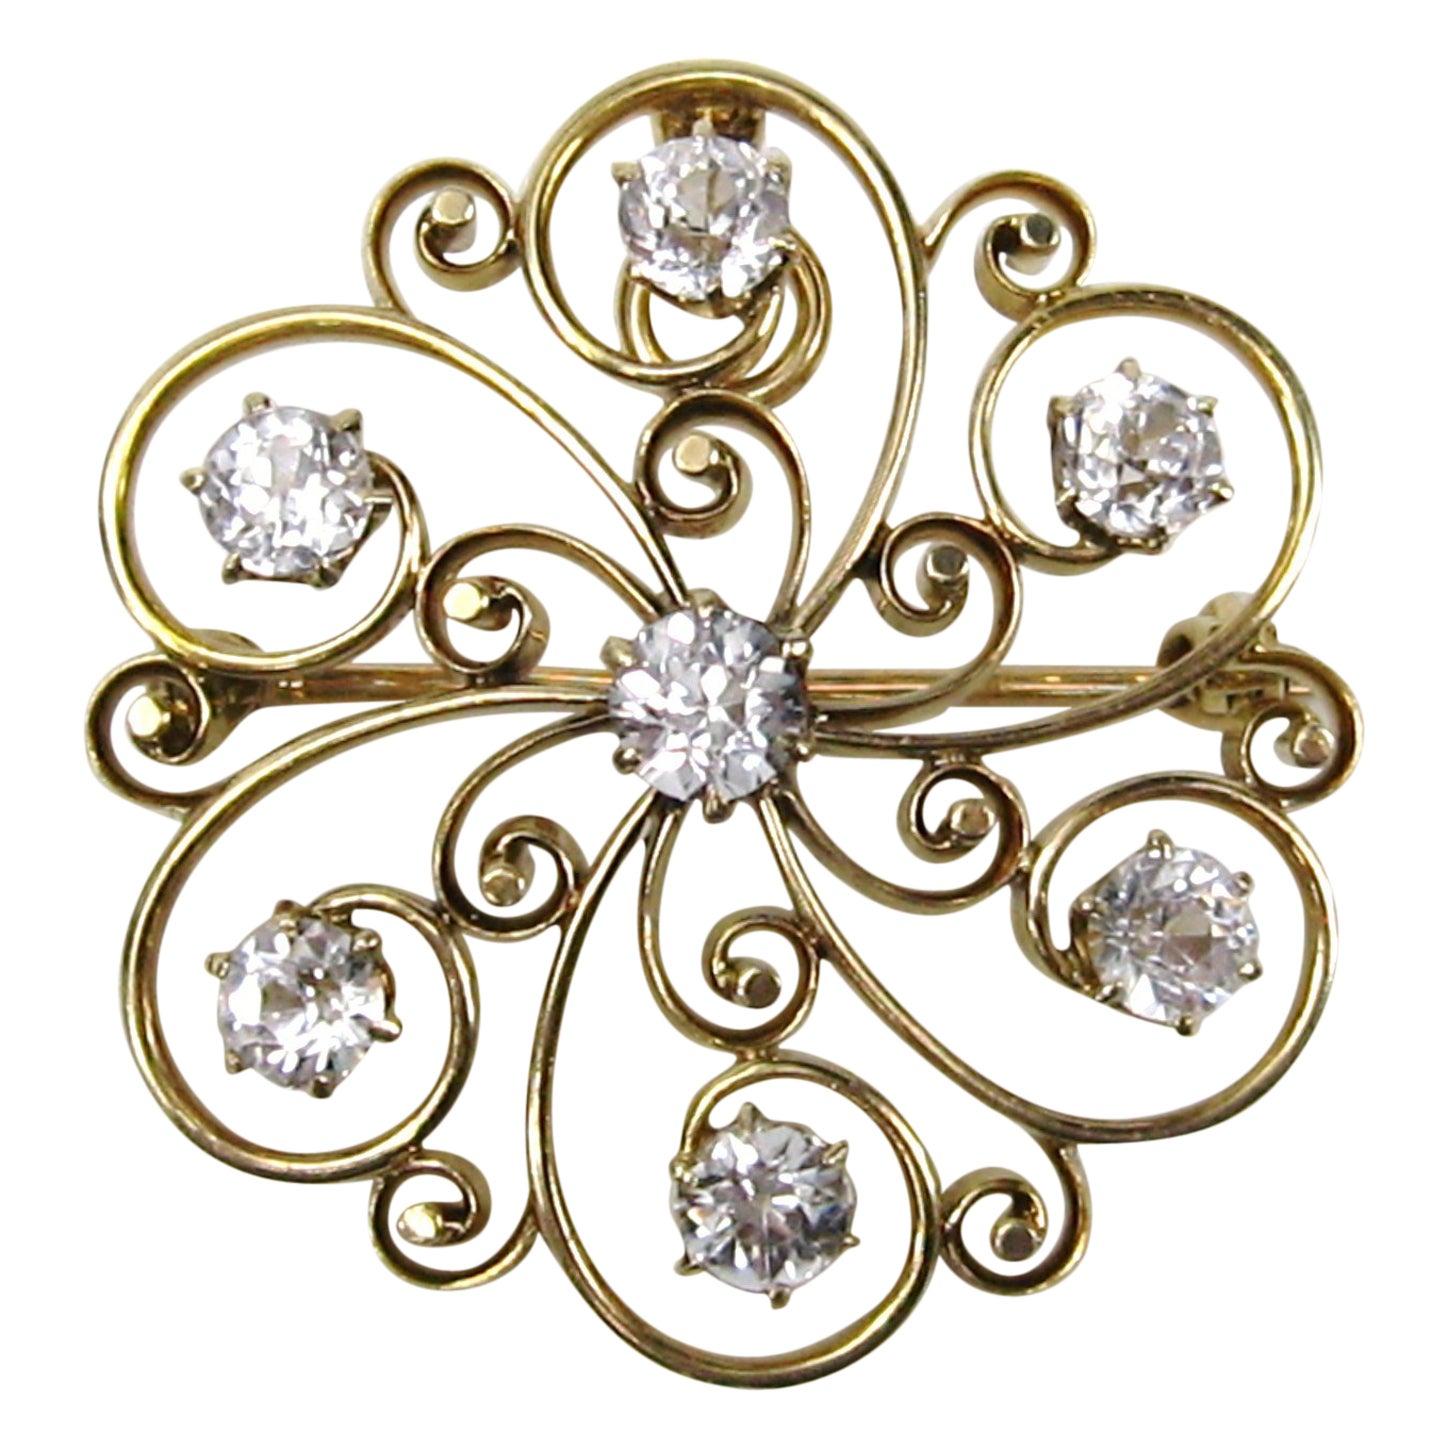 14 Karat White Gold Sapphire Pendant or Brooch Antique